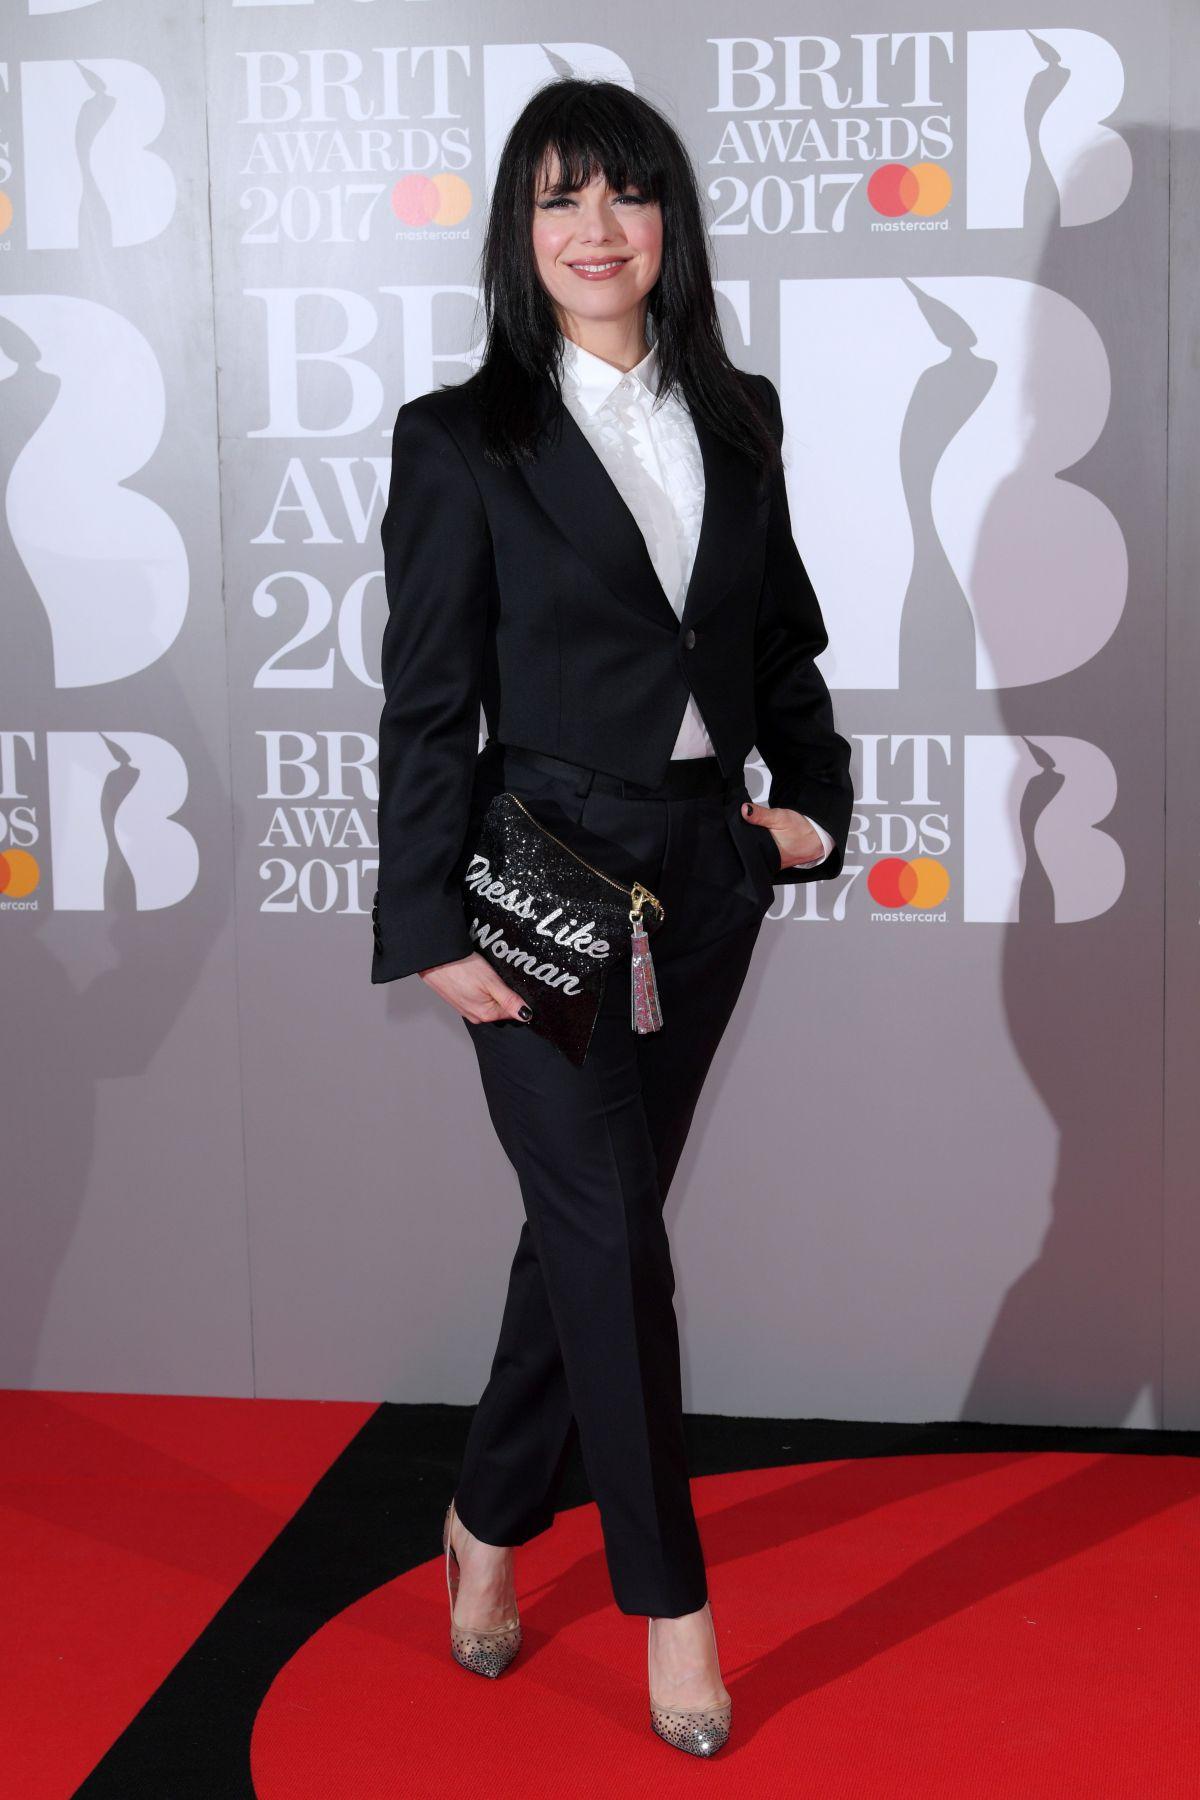 IMELDA MAY at Brit Awards 2017 in London 02/22/2017